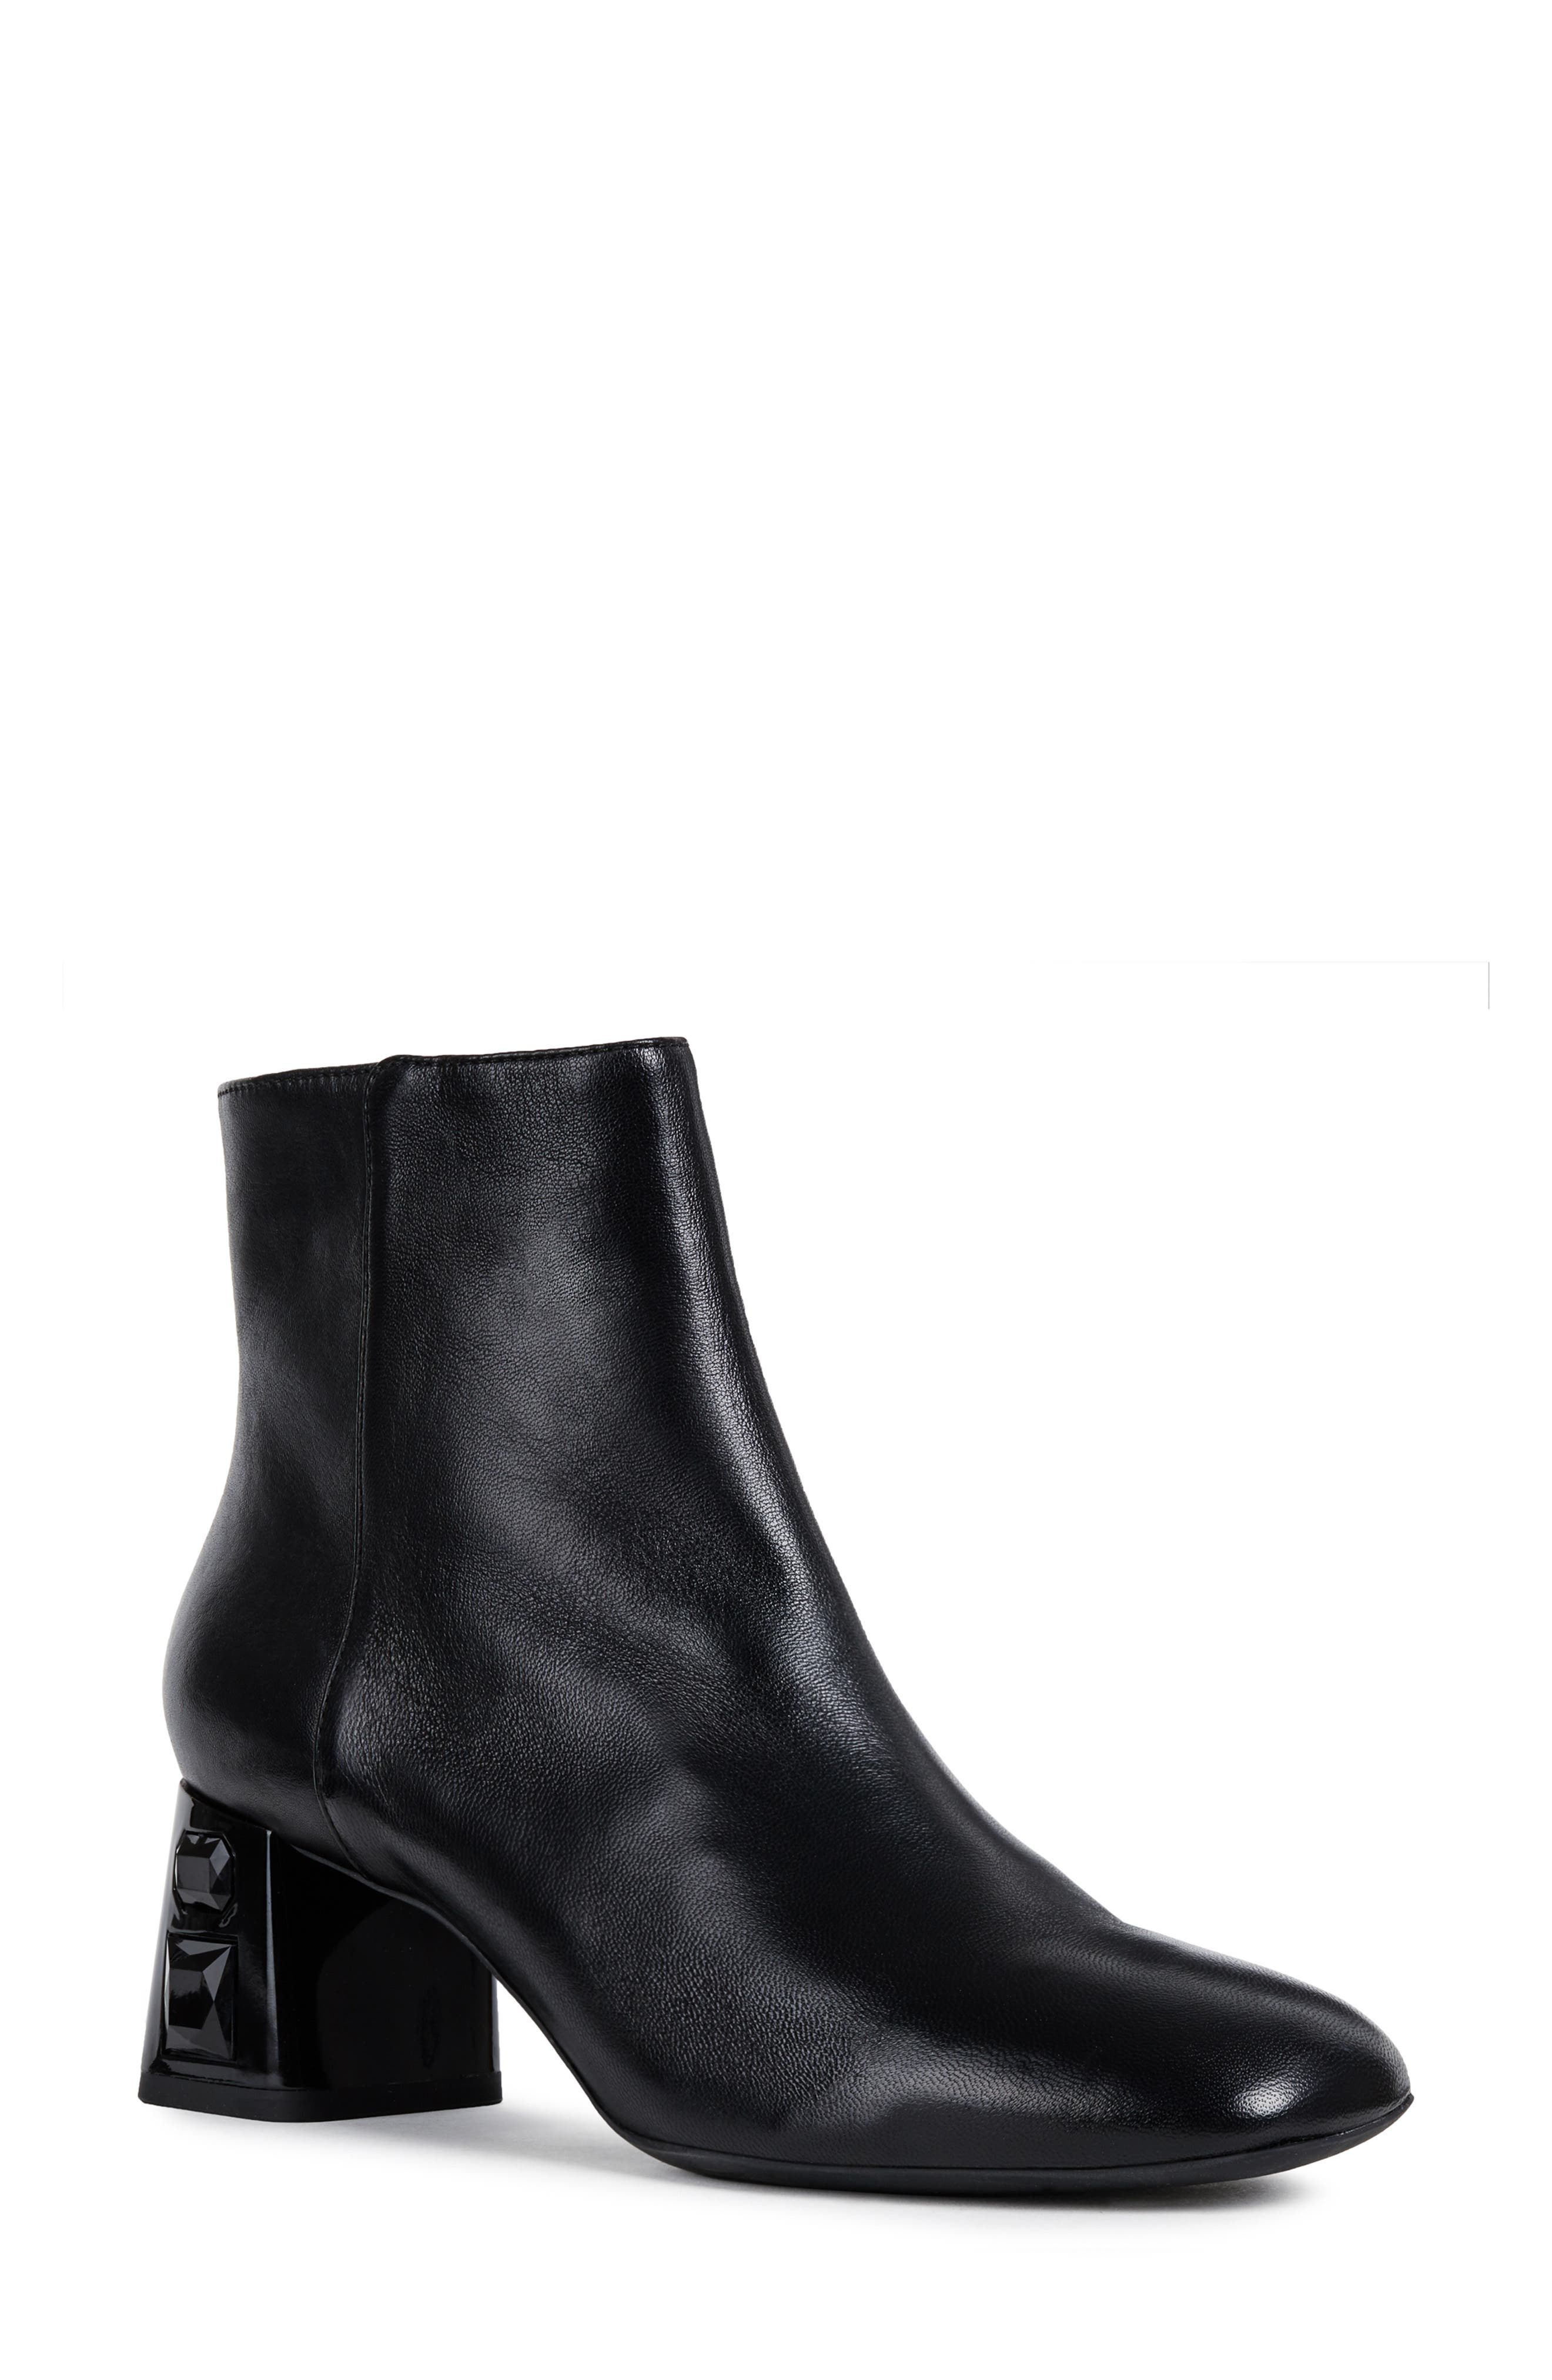 GEOX Seyla Bootie in Black Leather